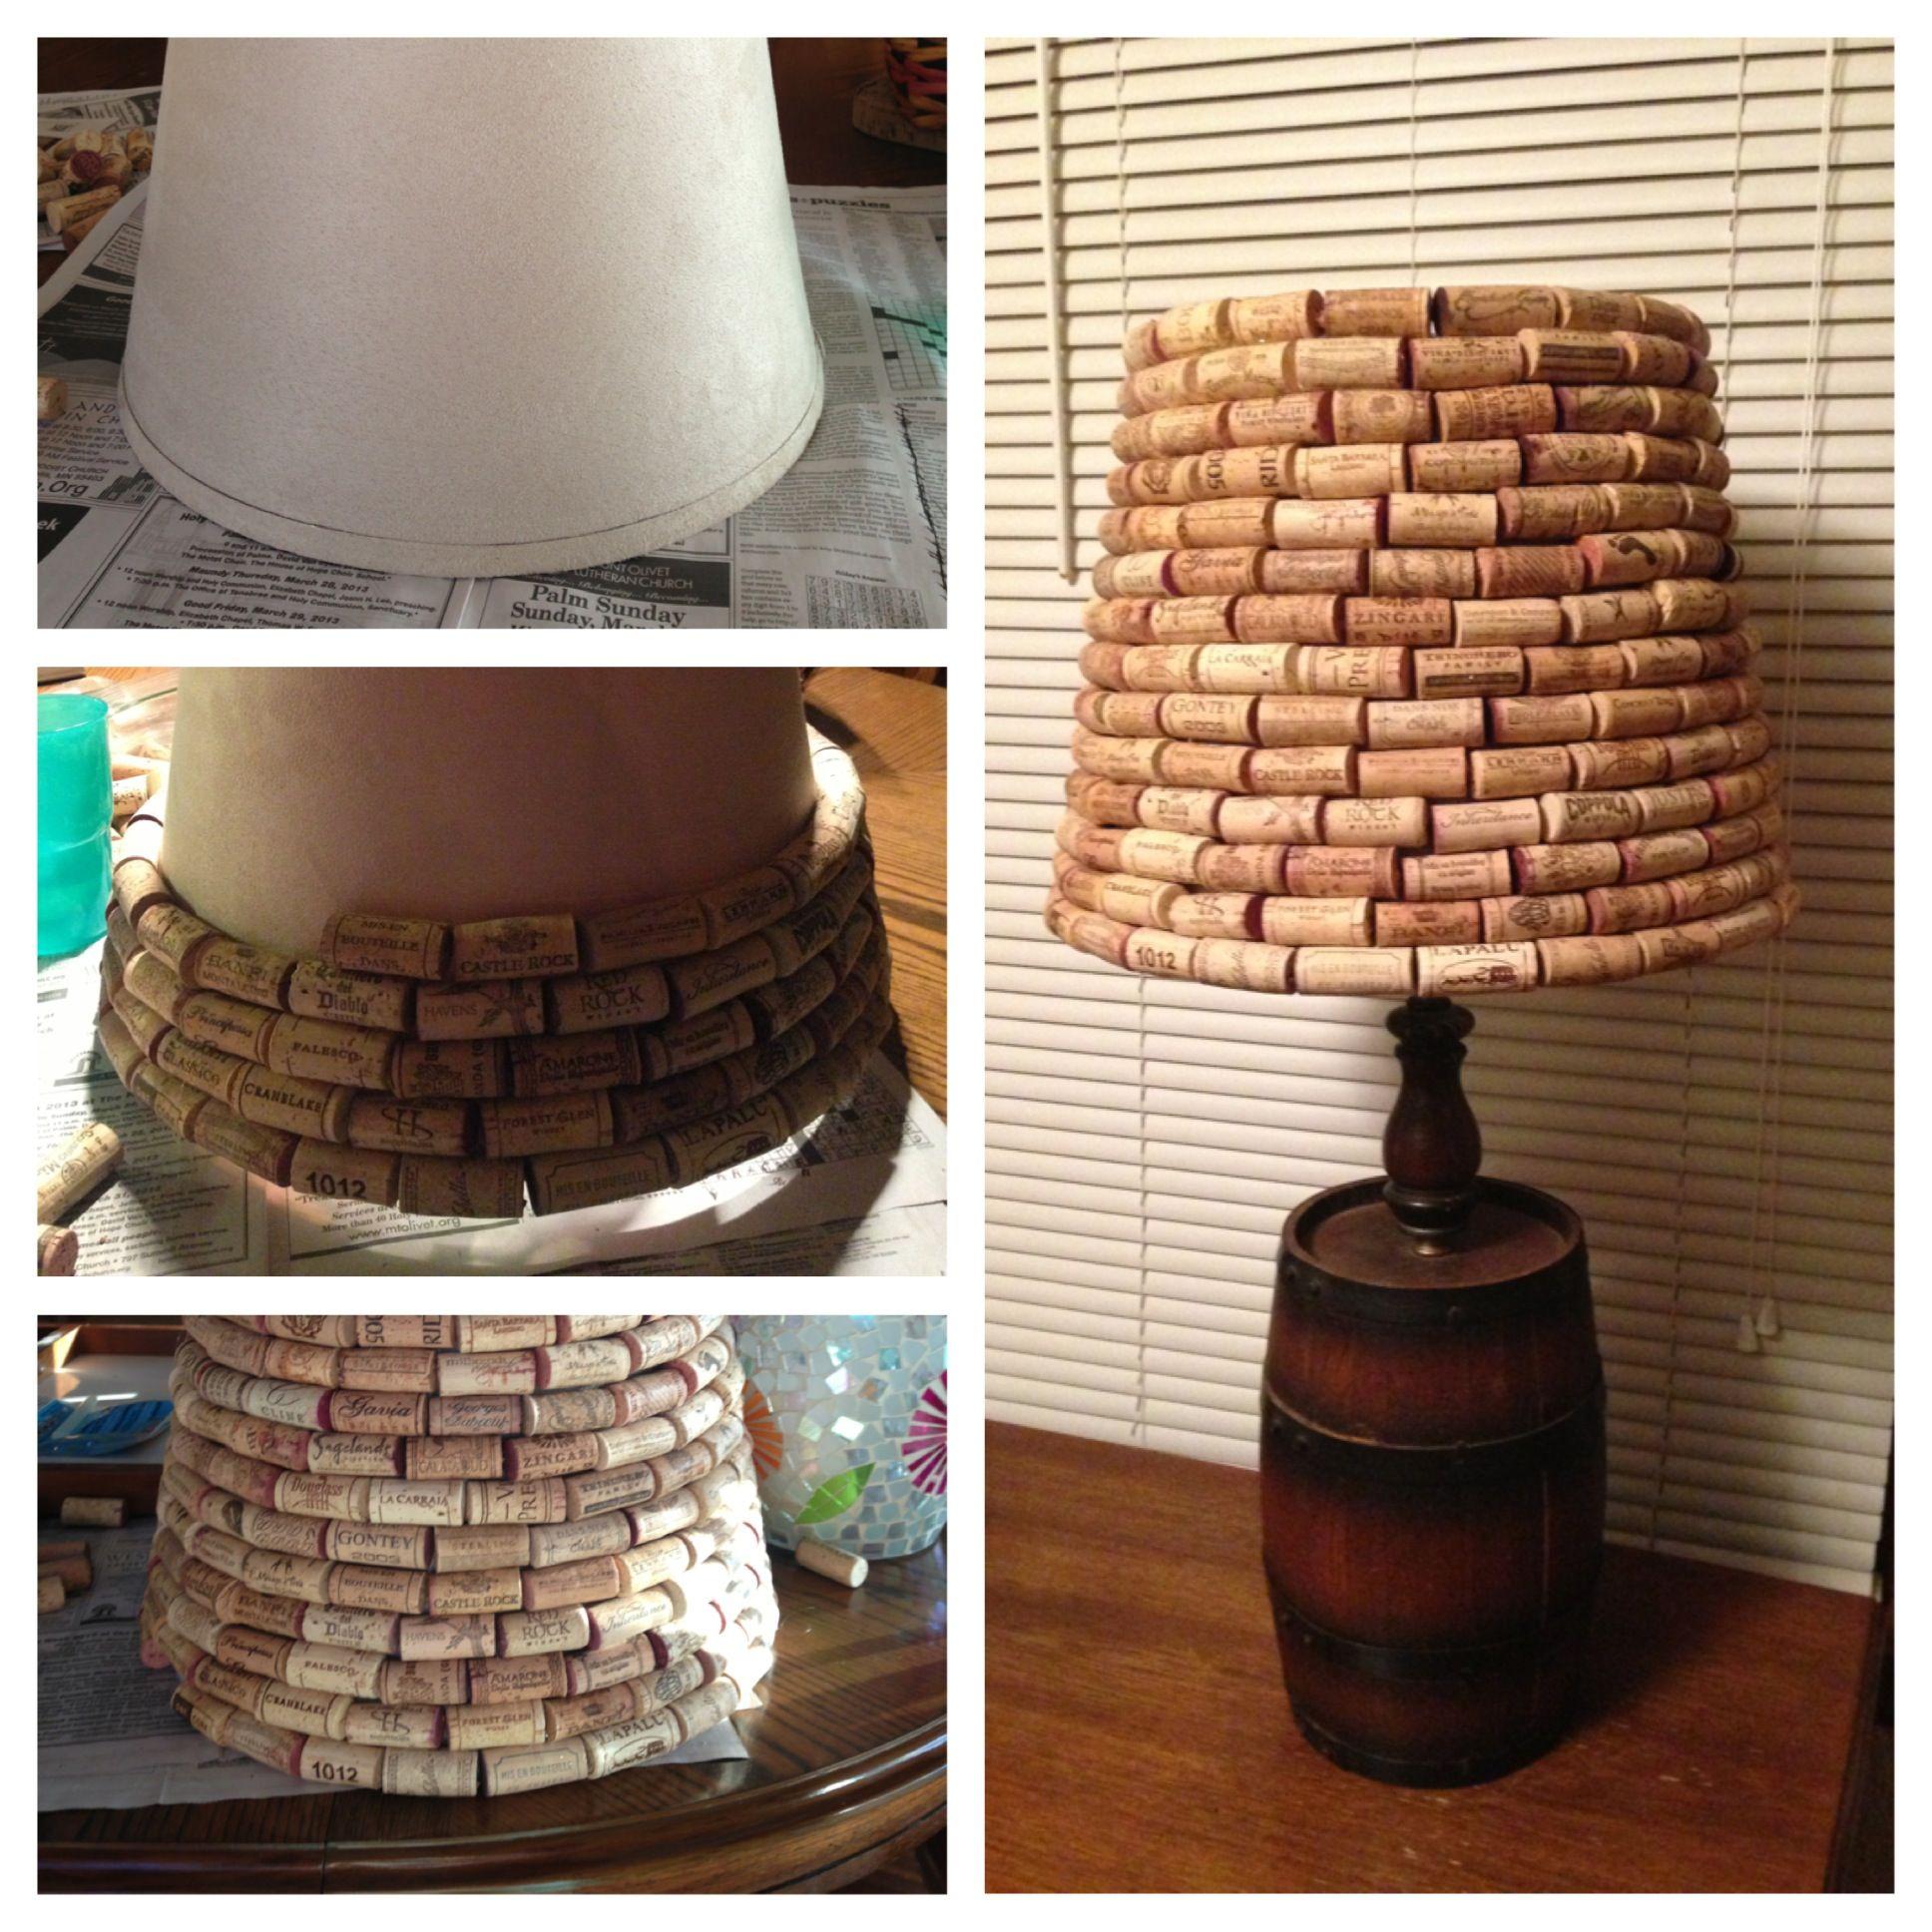 10 wine cork crafts to lighten your holidays cork crafts cork 10 wine cork crafts to lighten your holidays aloadofball Choice Image